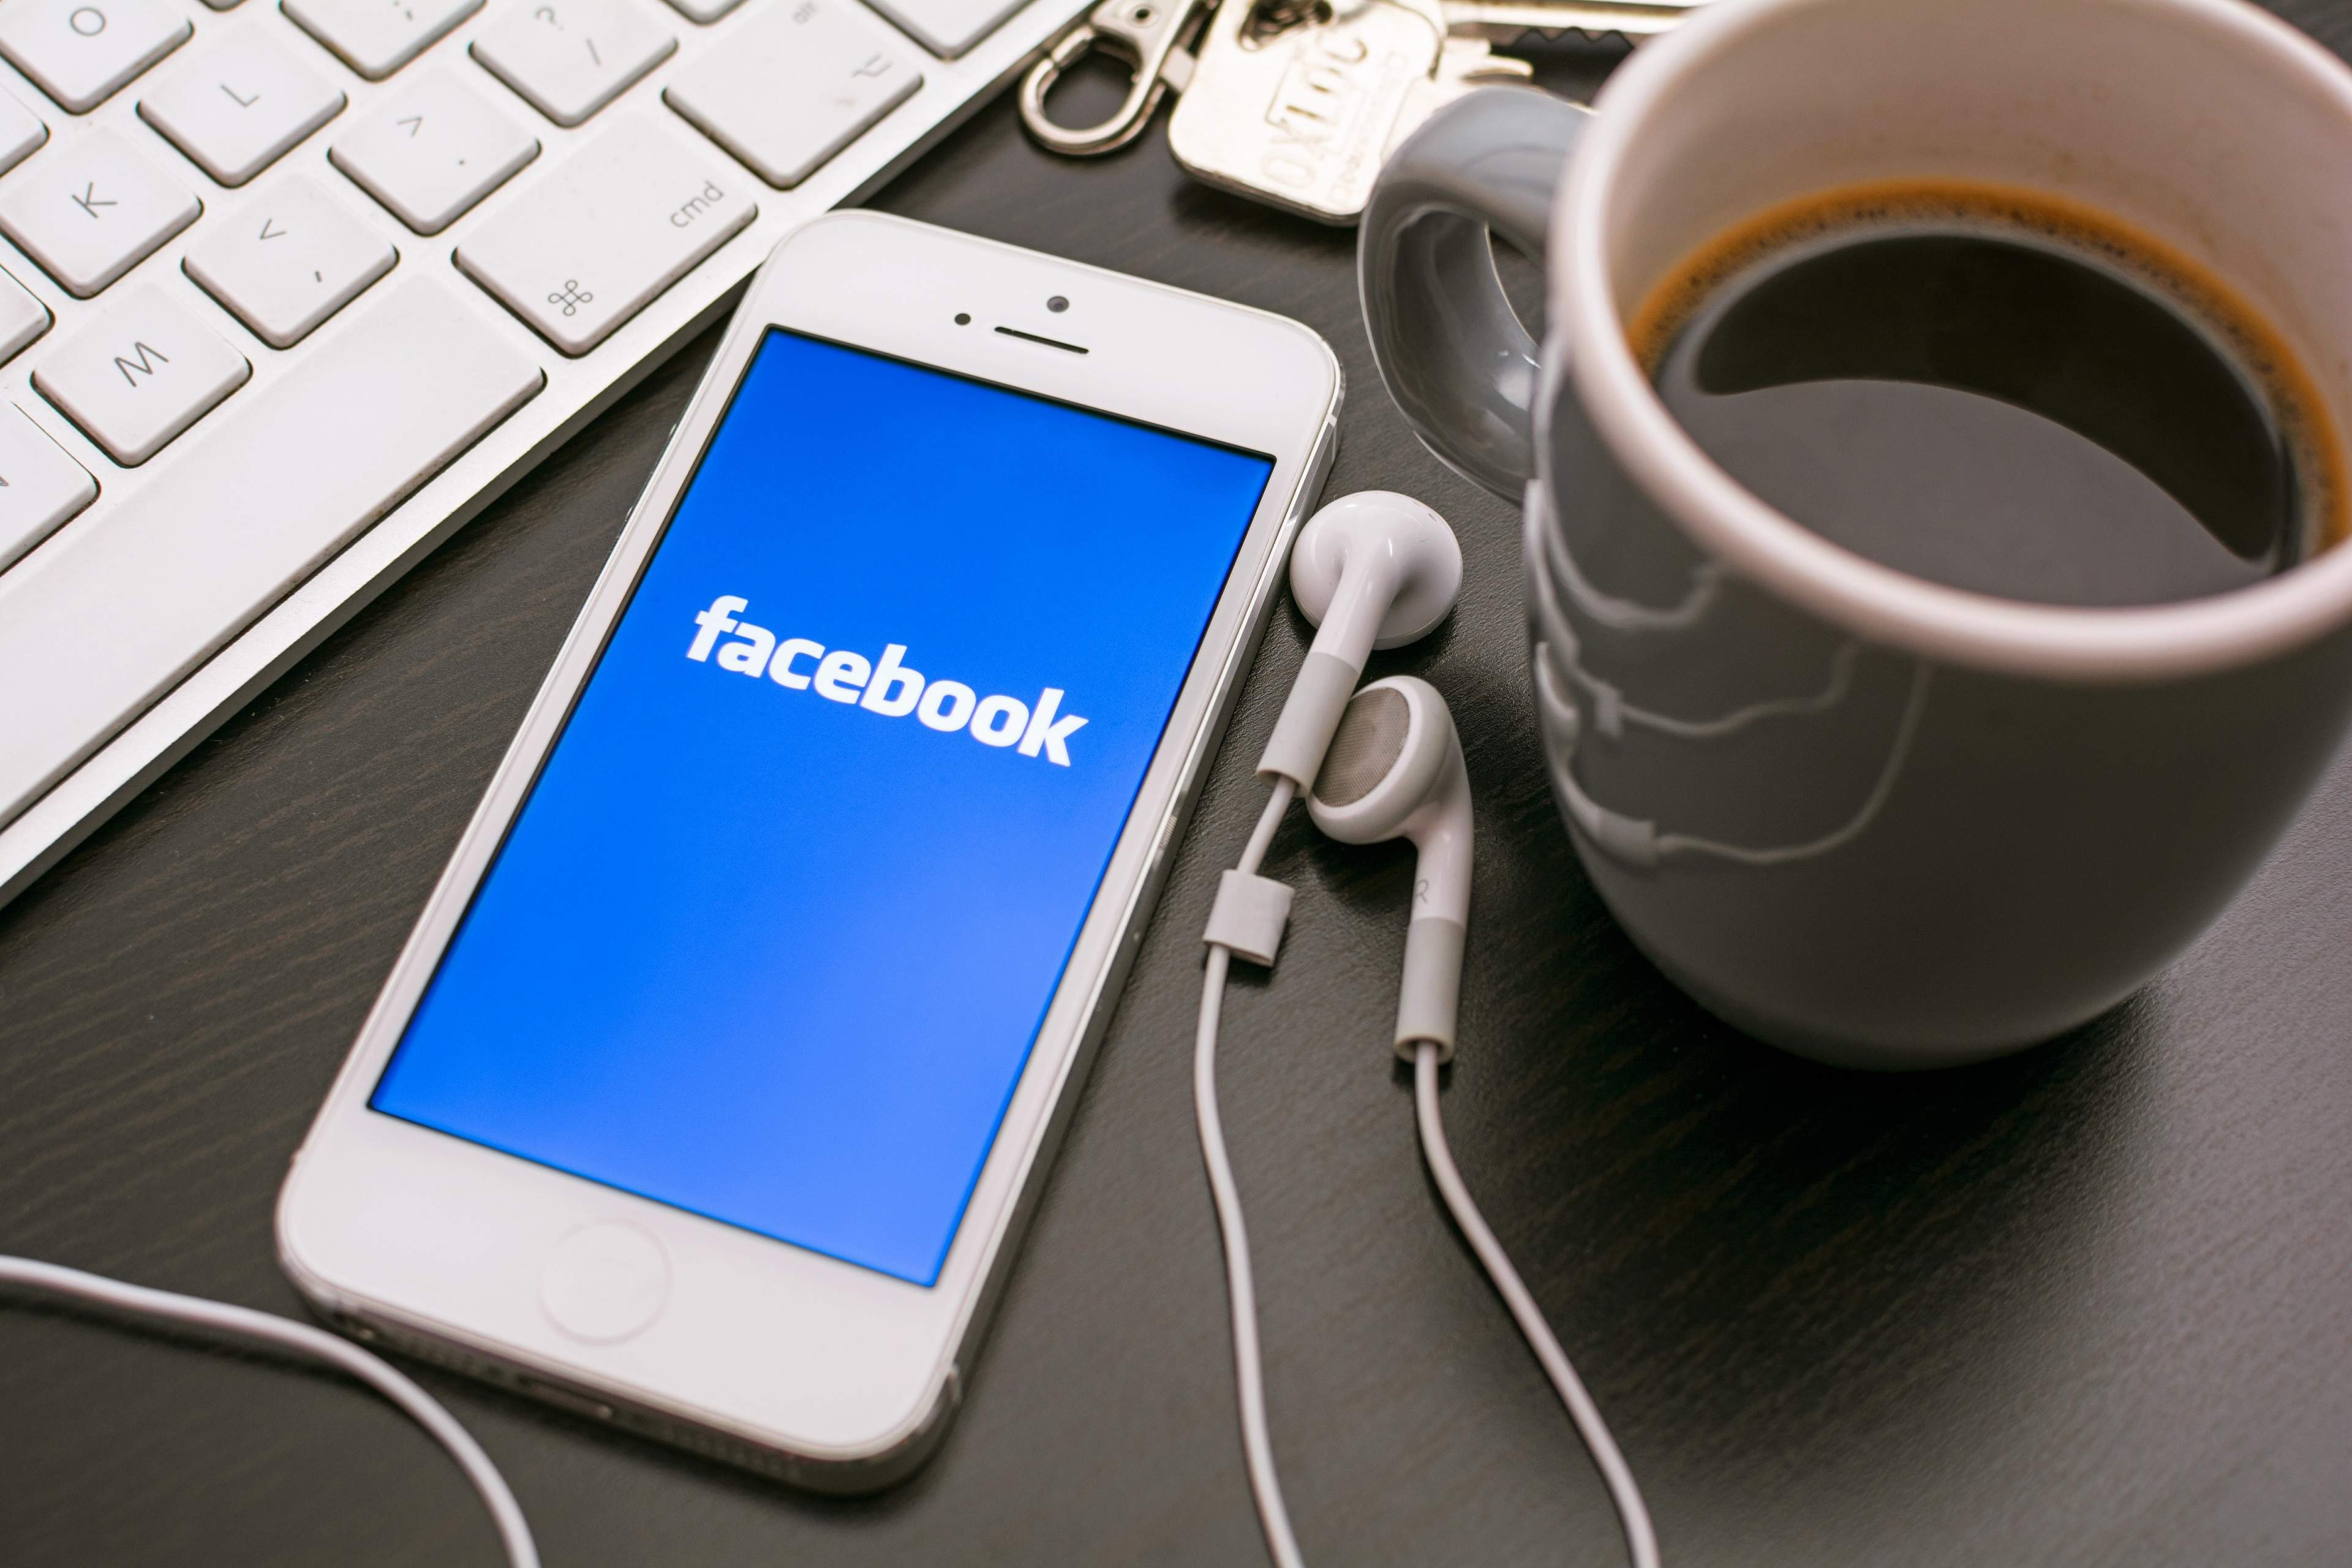 10 ways to spot fake news, according to Facebook